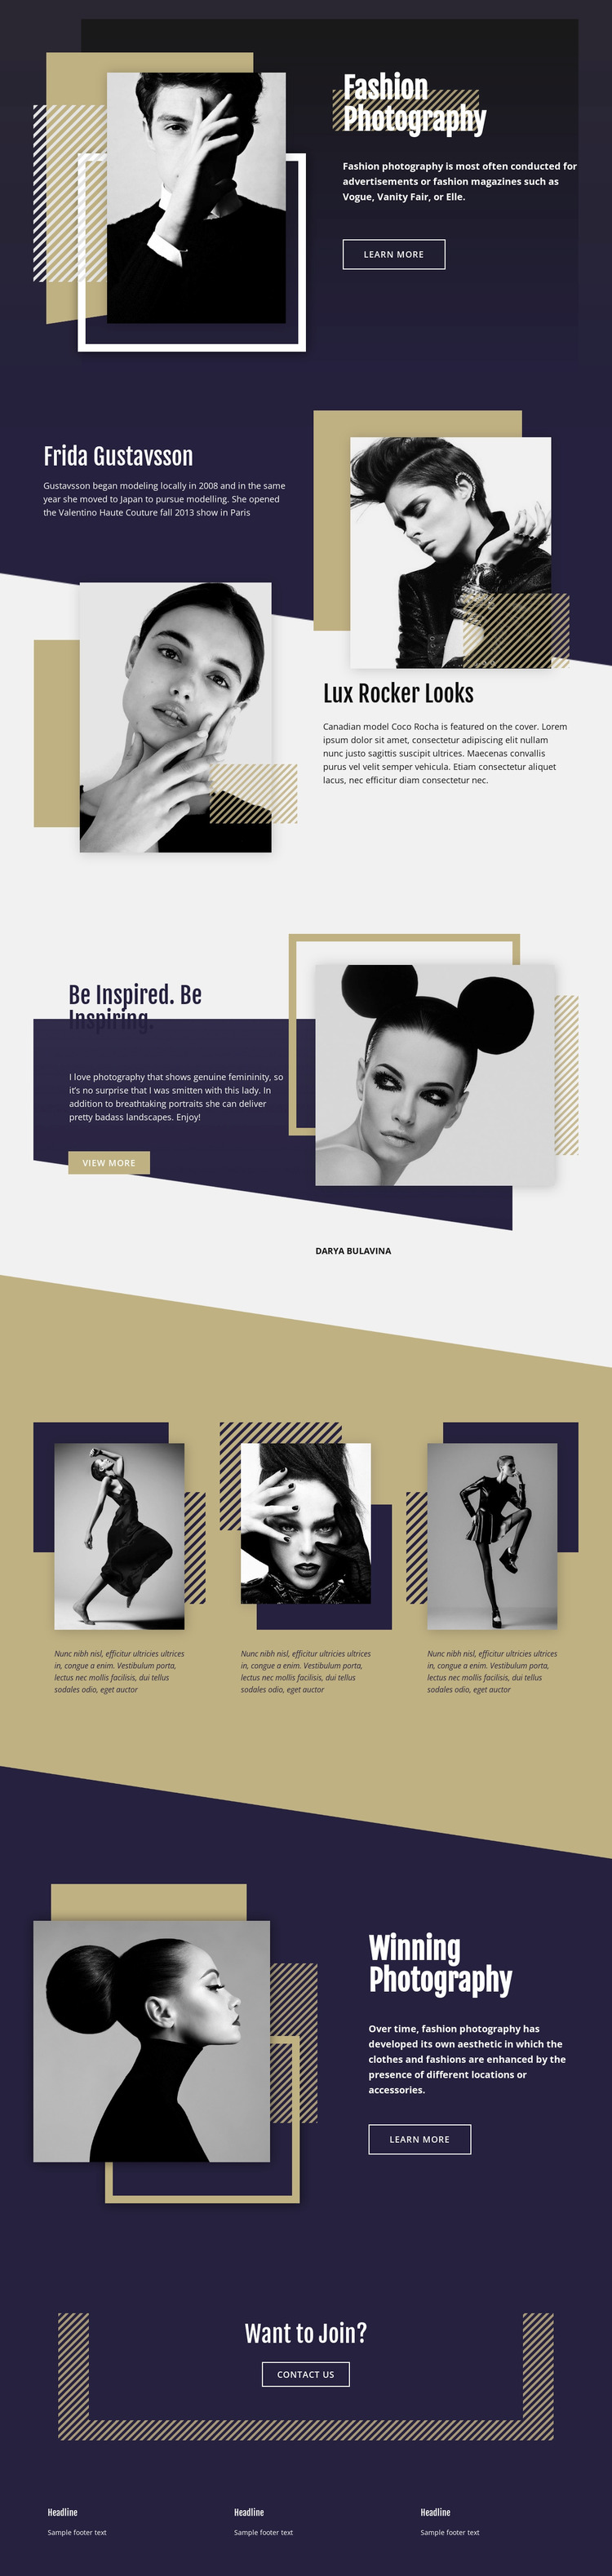 Fashion Photography WordPress Website Builder